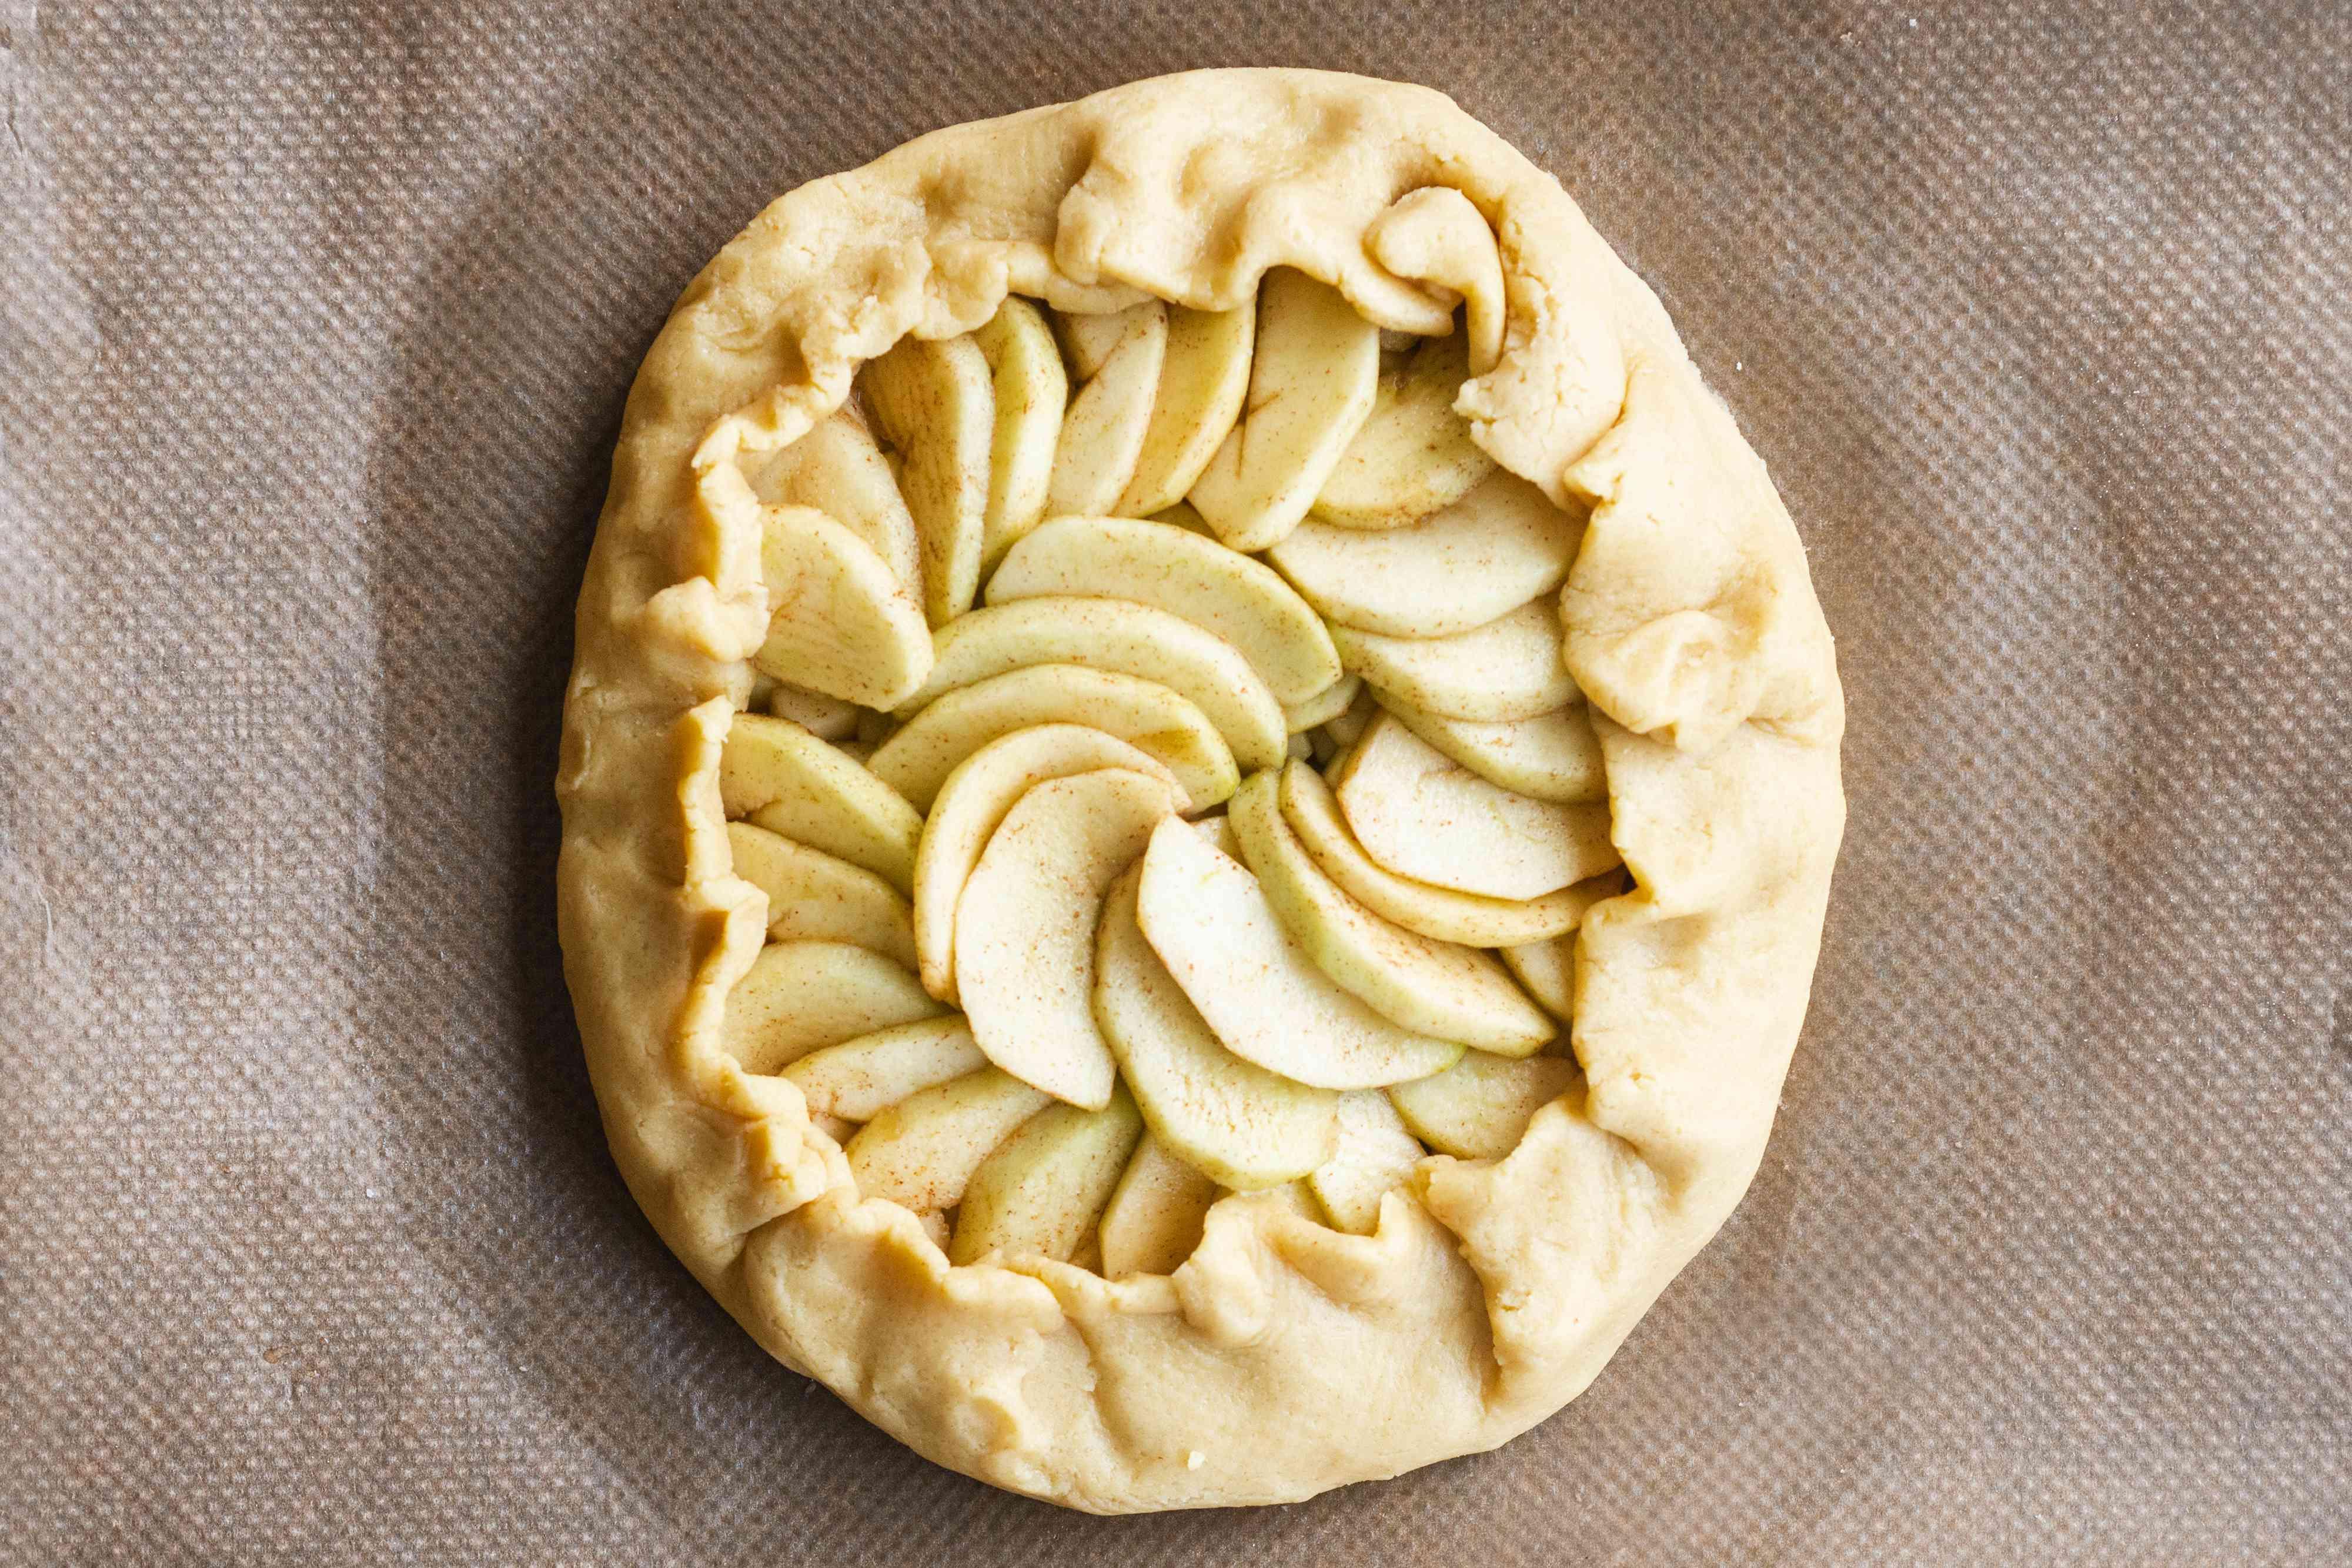 wrap the pastry around